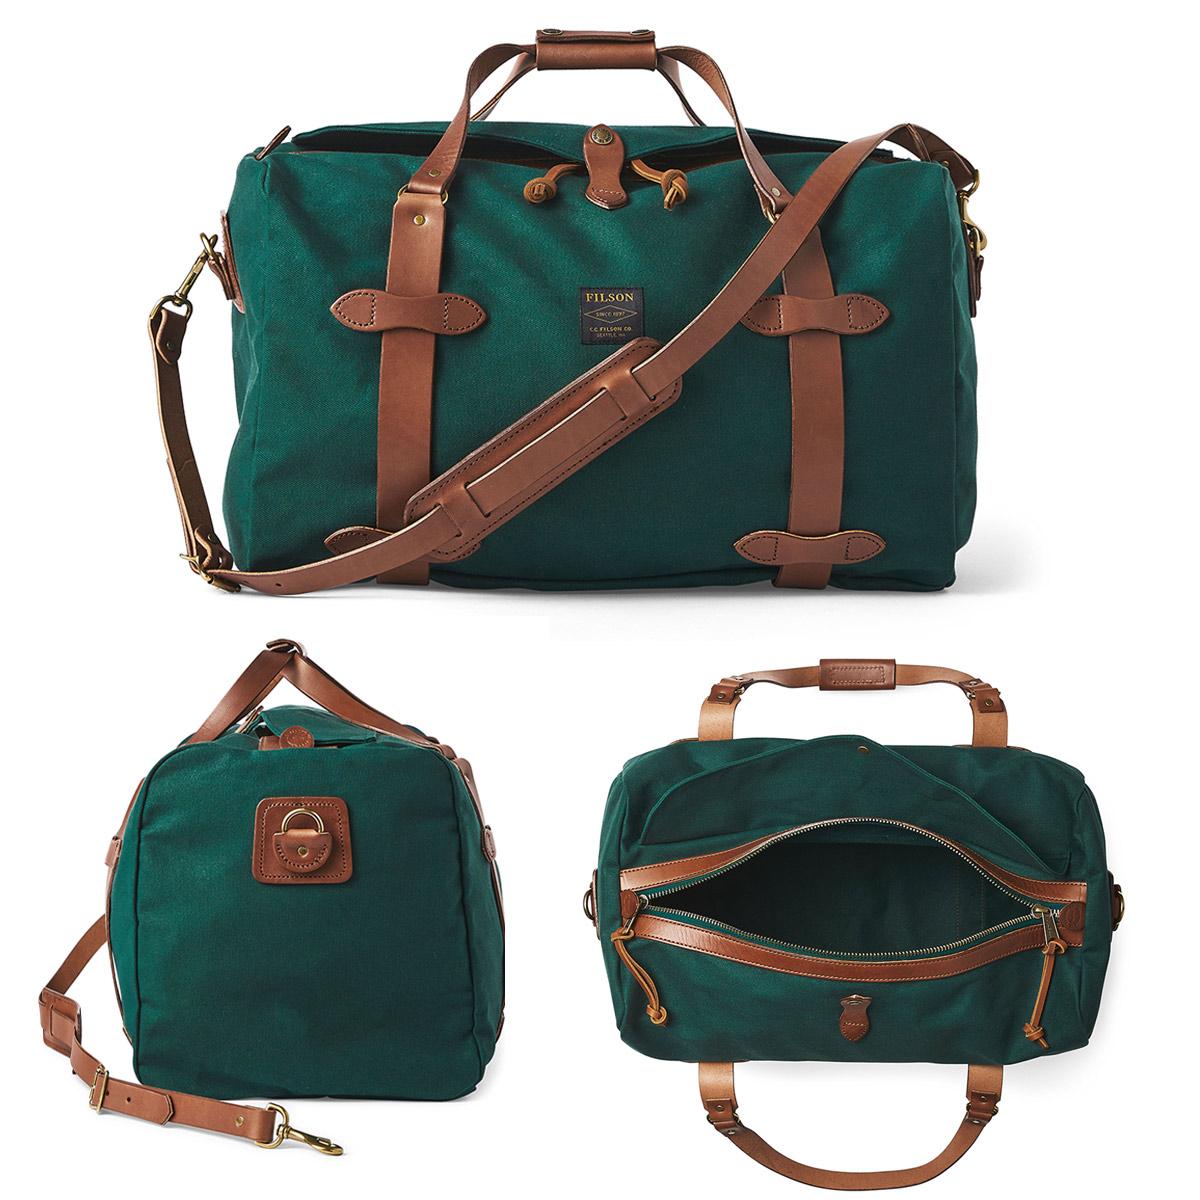 Filson Duffle Medium Hemlock, travelbag made for heavy-duty trips